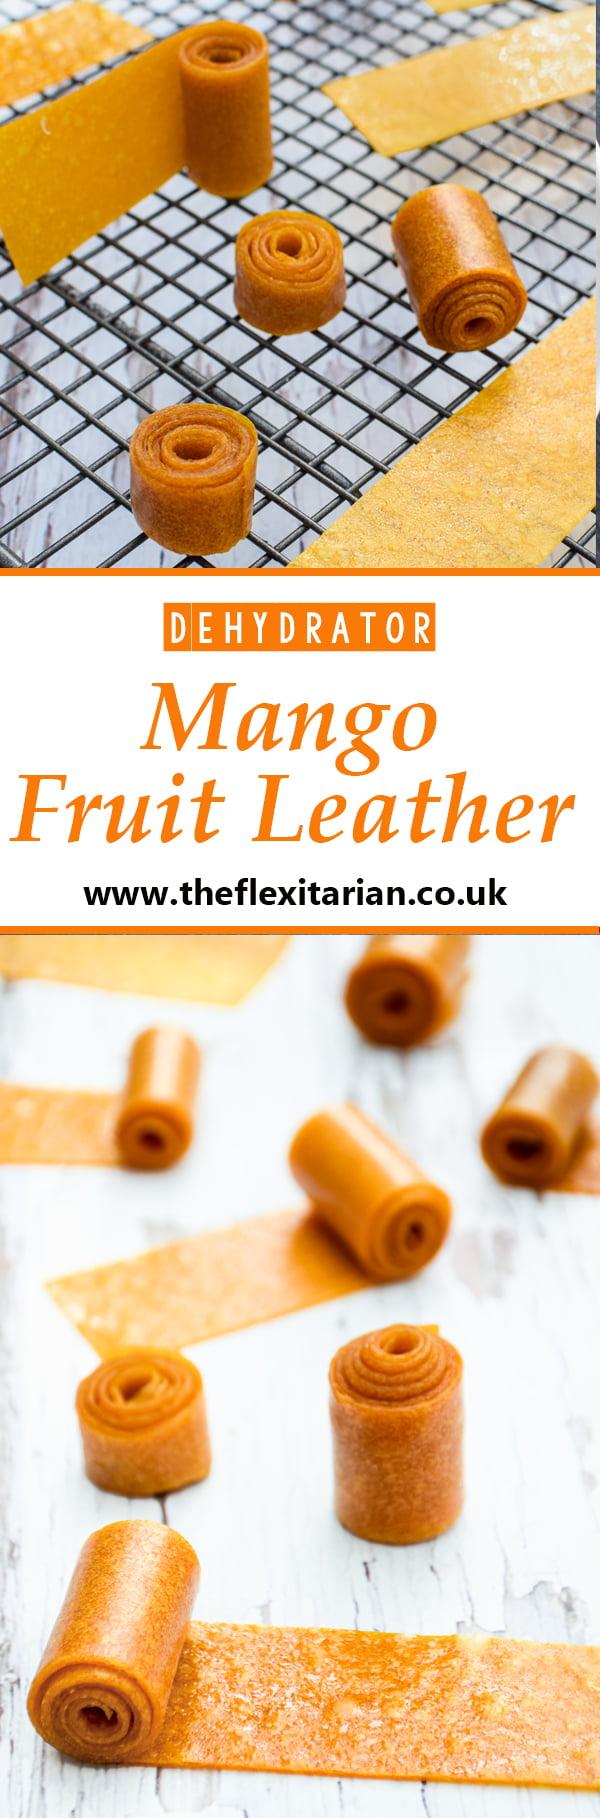 Mango Fruit Leather BioChef Arizona Sol Food Dehydrator © 2019 - Annabelle Randles : The Flexitarian : www.theflexitarian.co.uk